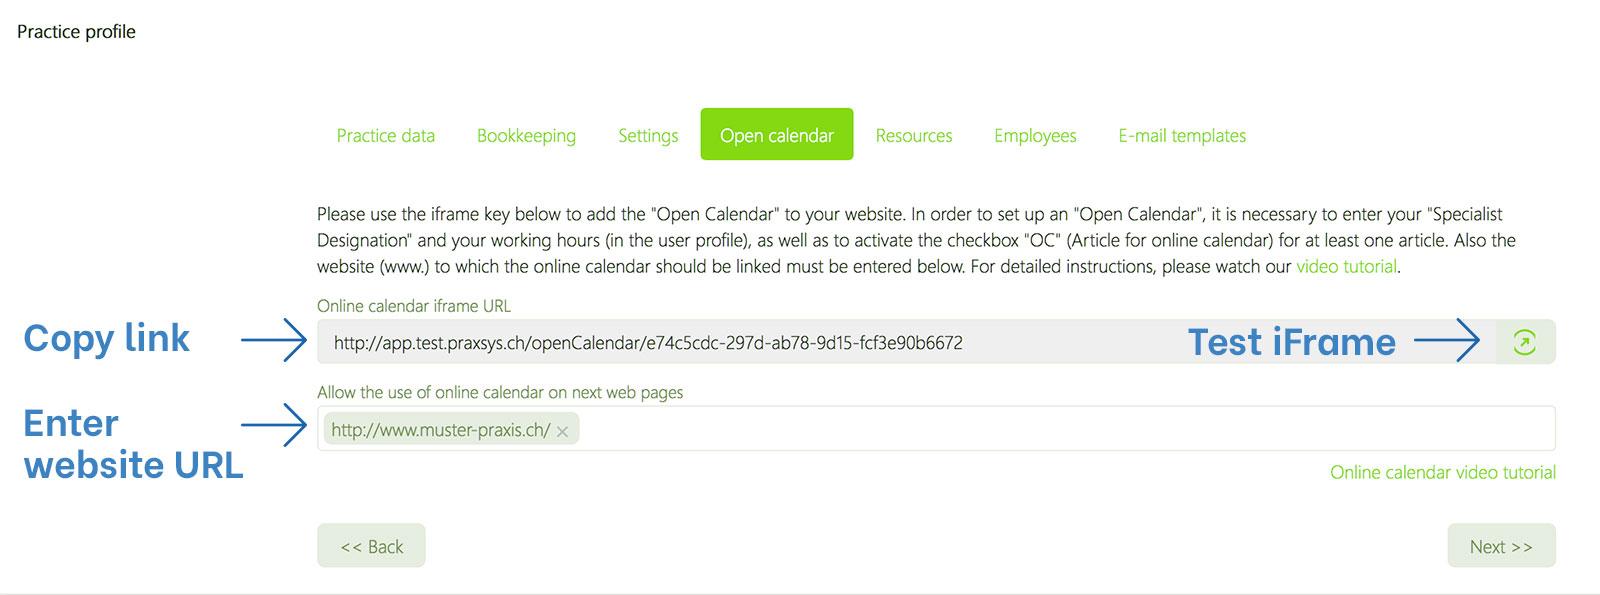 Embed online calendar in website